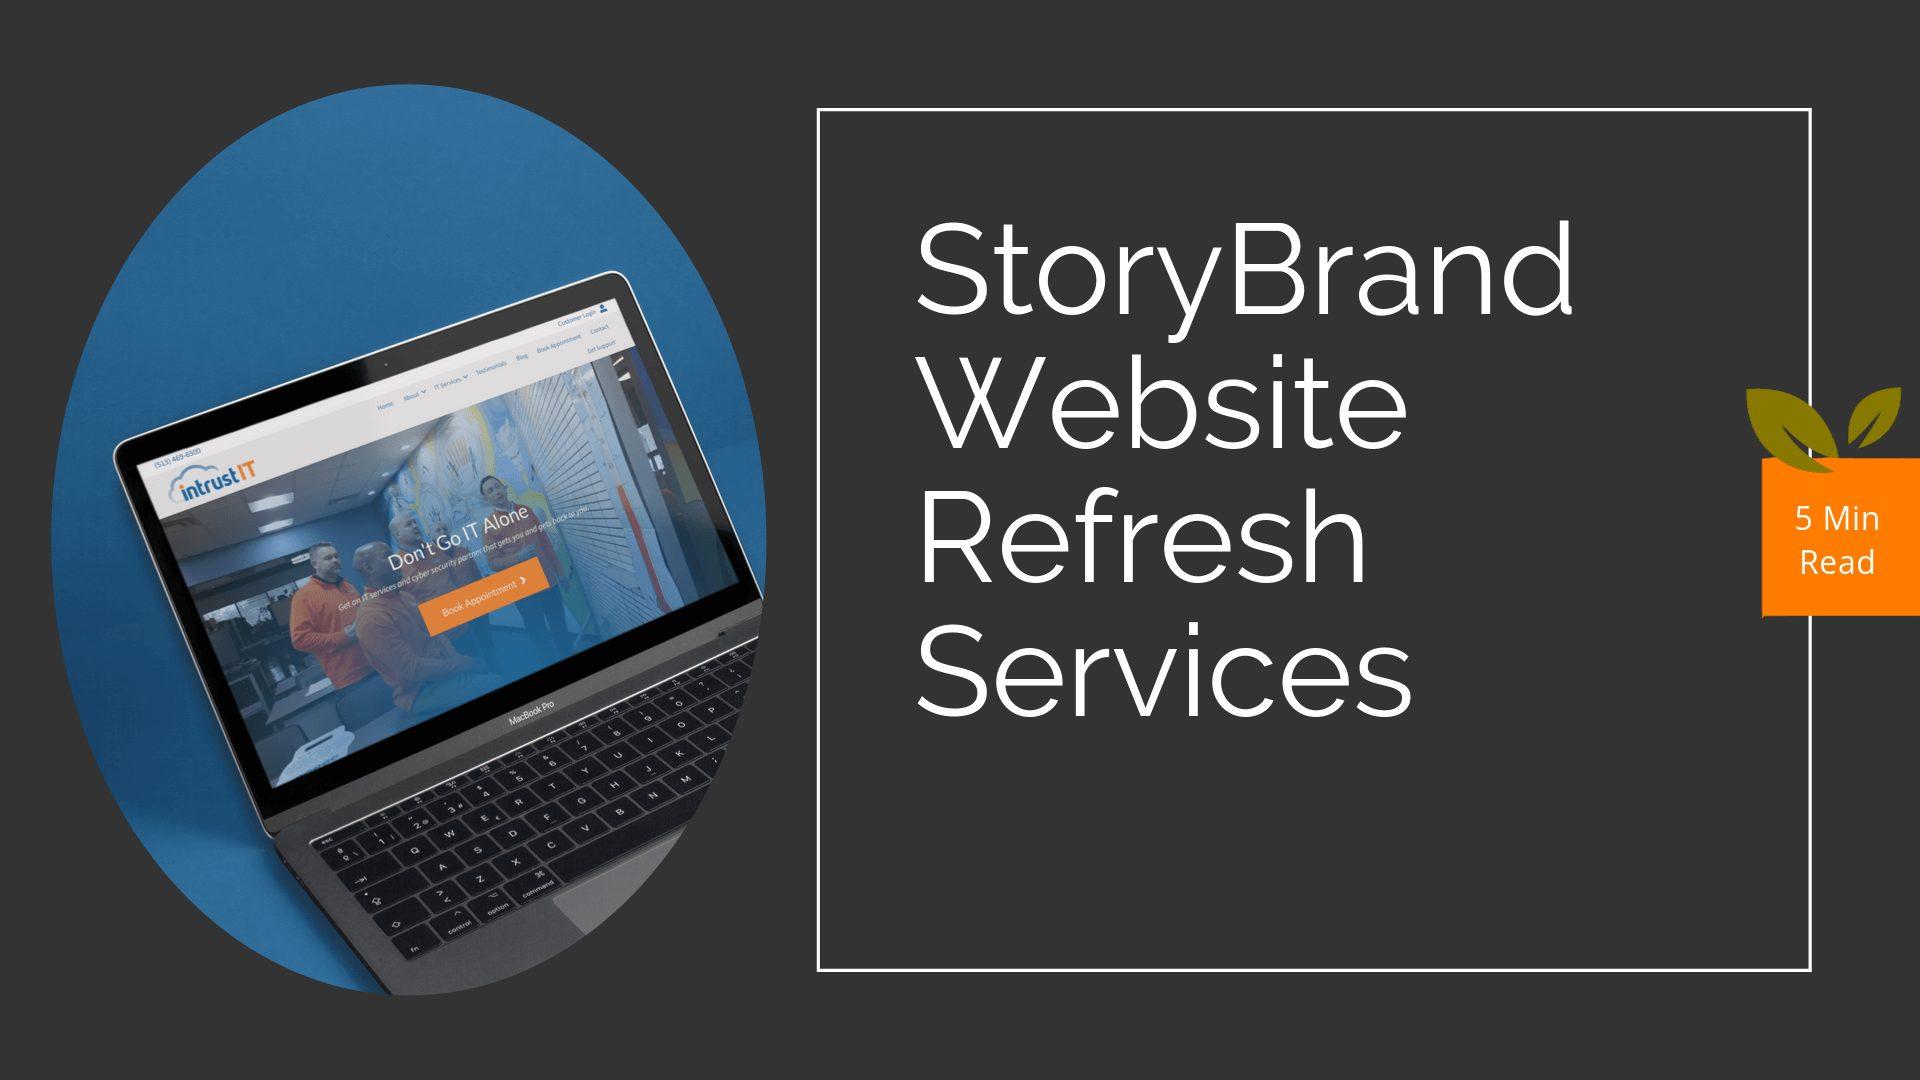 StoryBrand Website Refresh Services